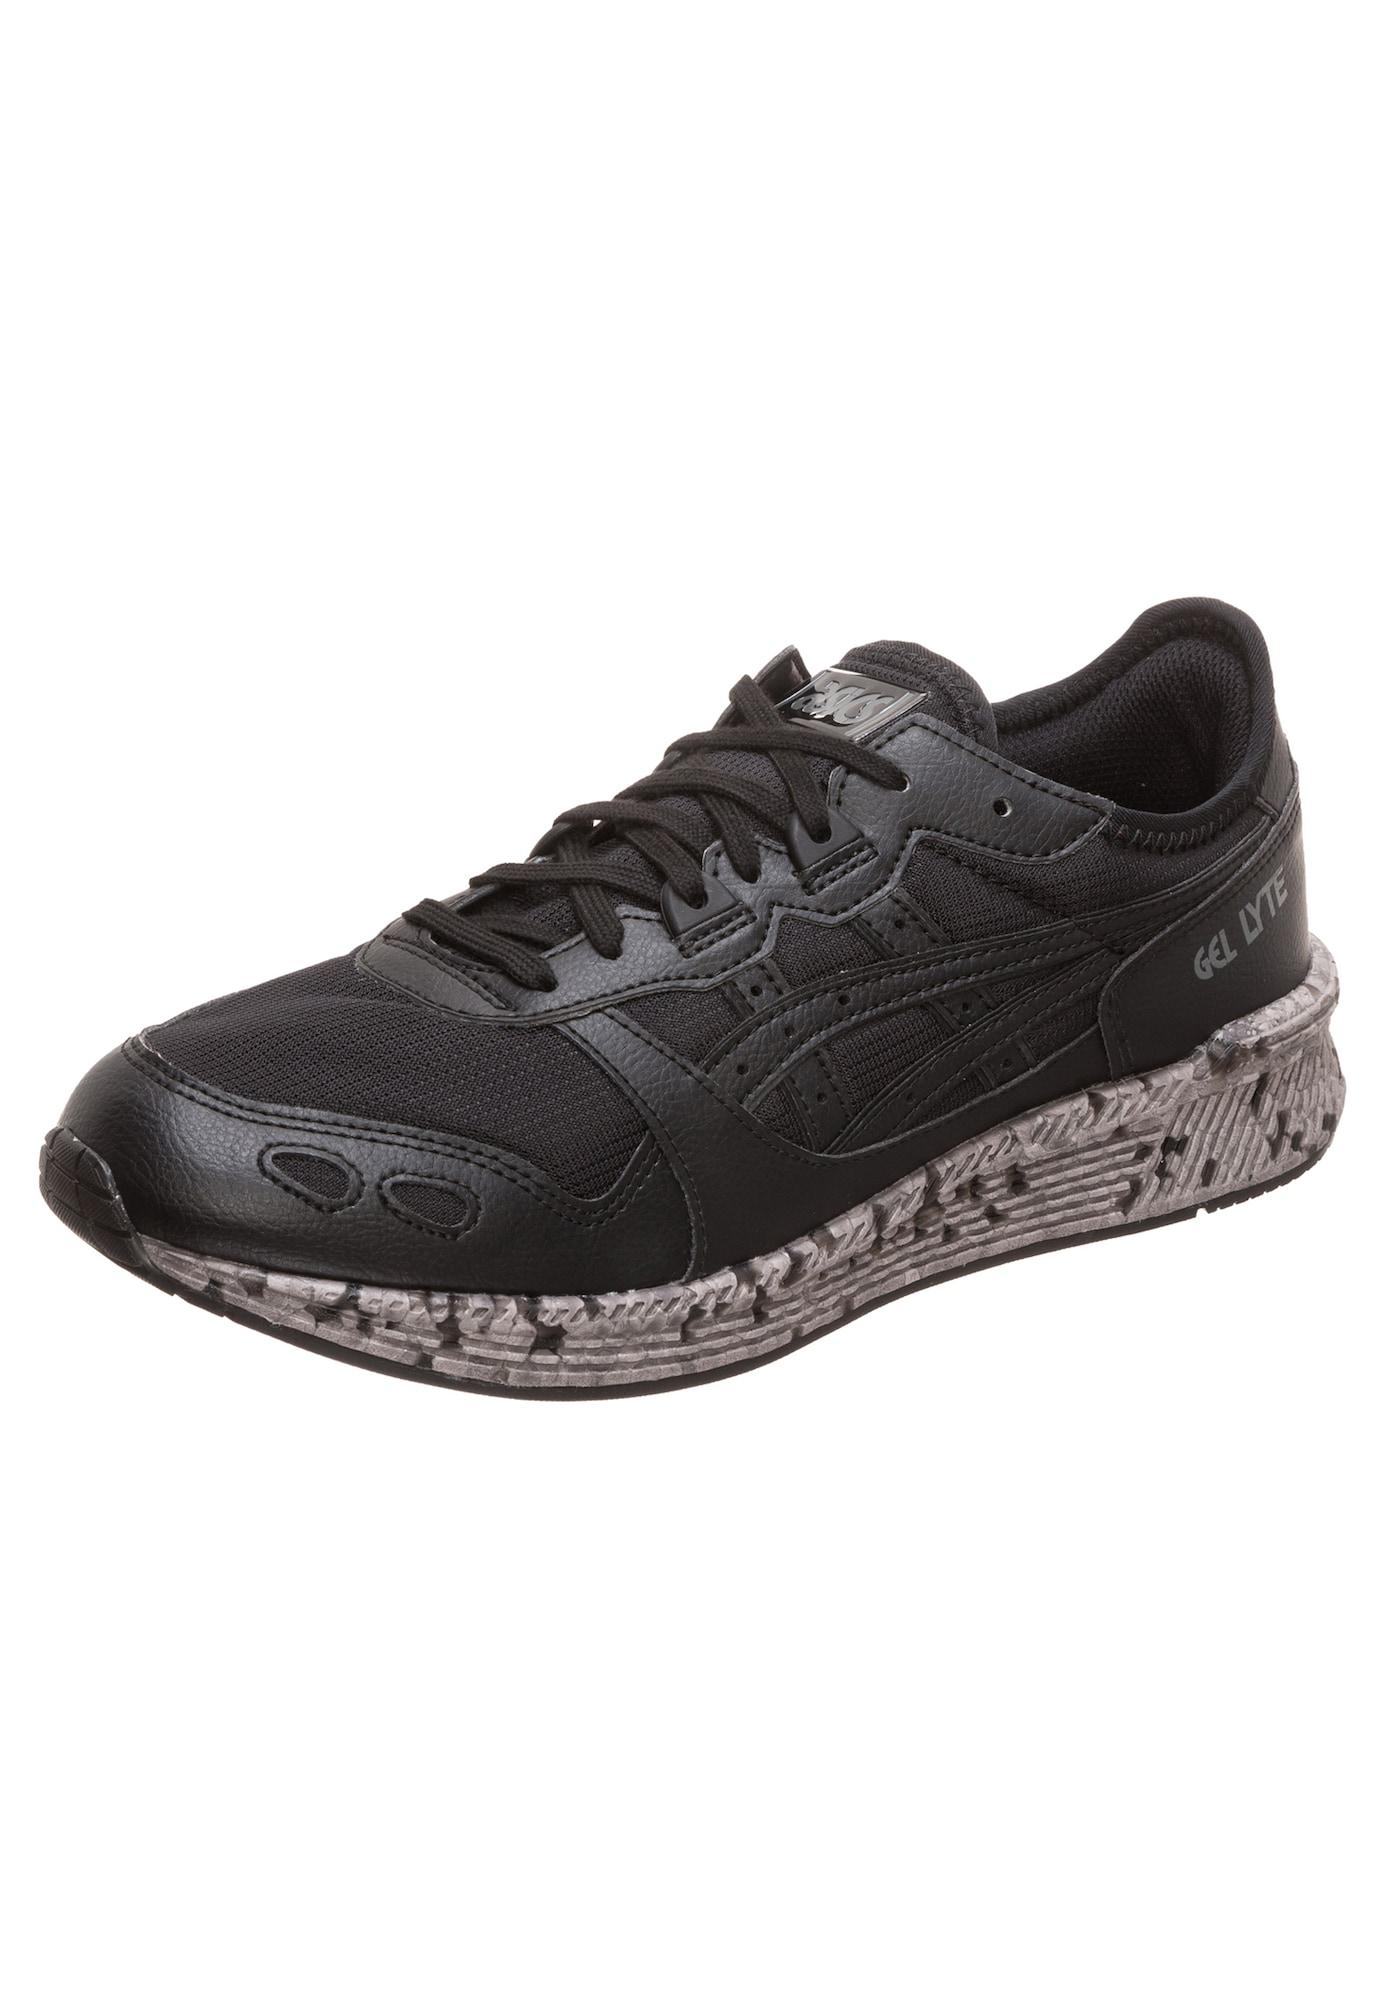 Asics Tiger, Heren Sneakers laag 'Hyper Gel-Lyte', zwart